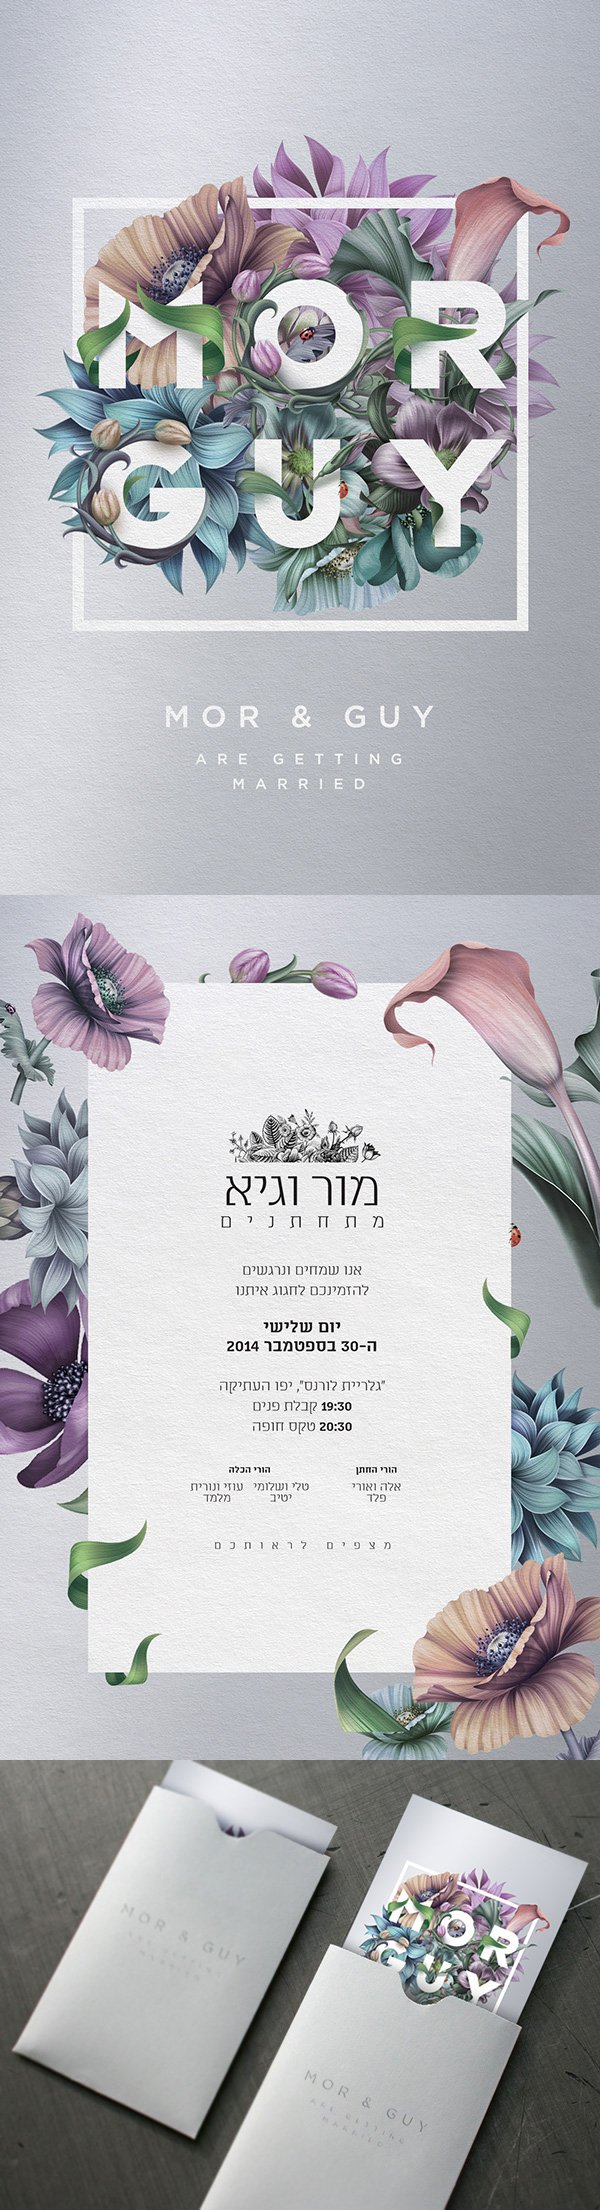 A showcase of 50 beautifully designed print invitations to inspire 02 use overlap stopboris Gallery